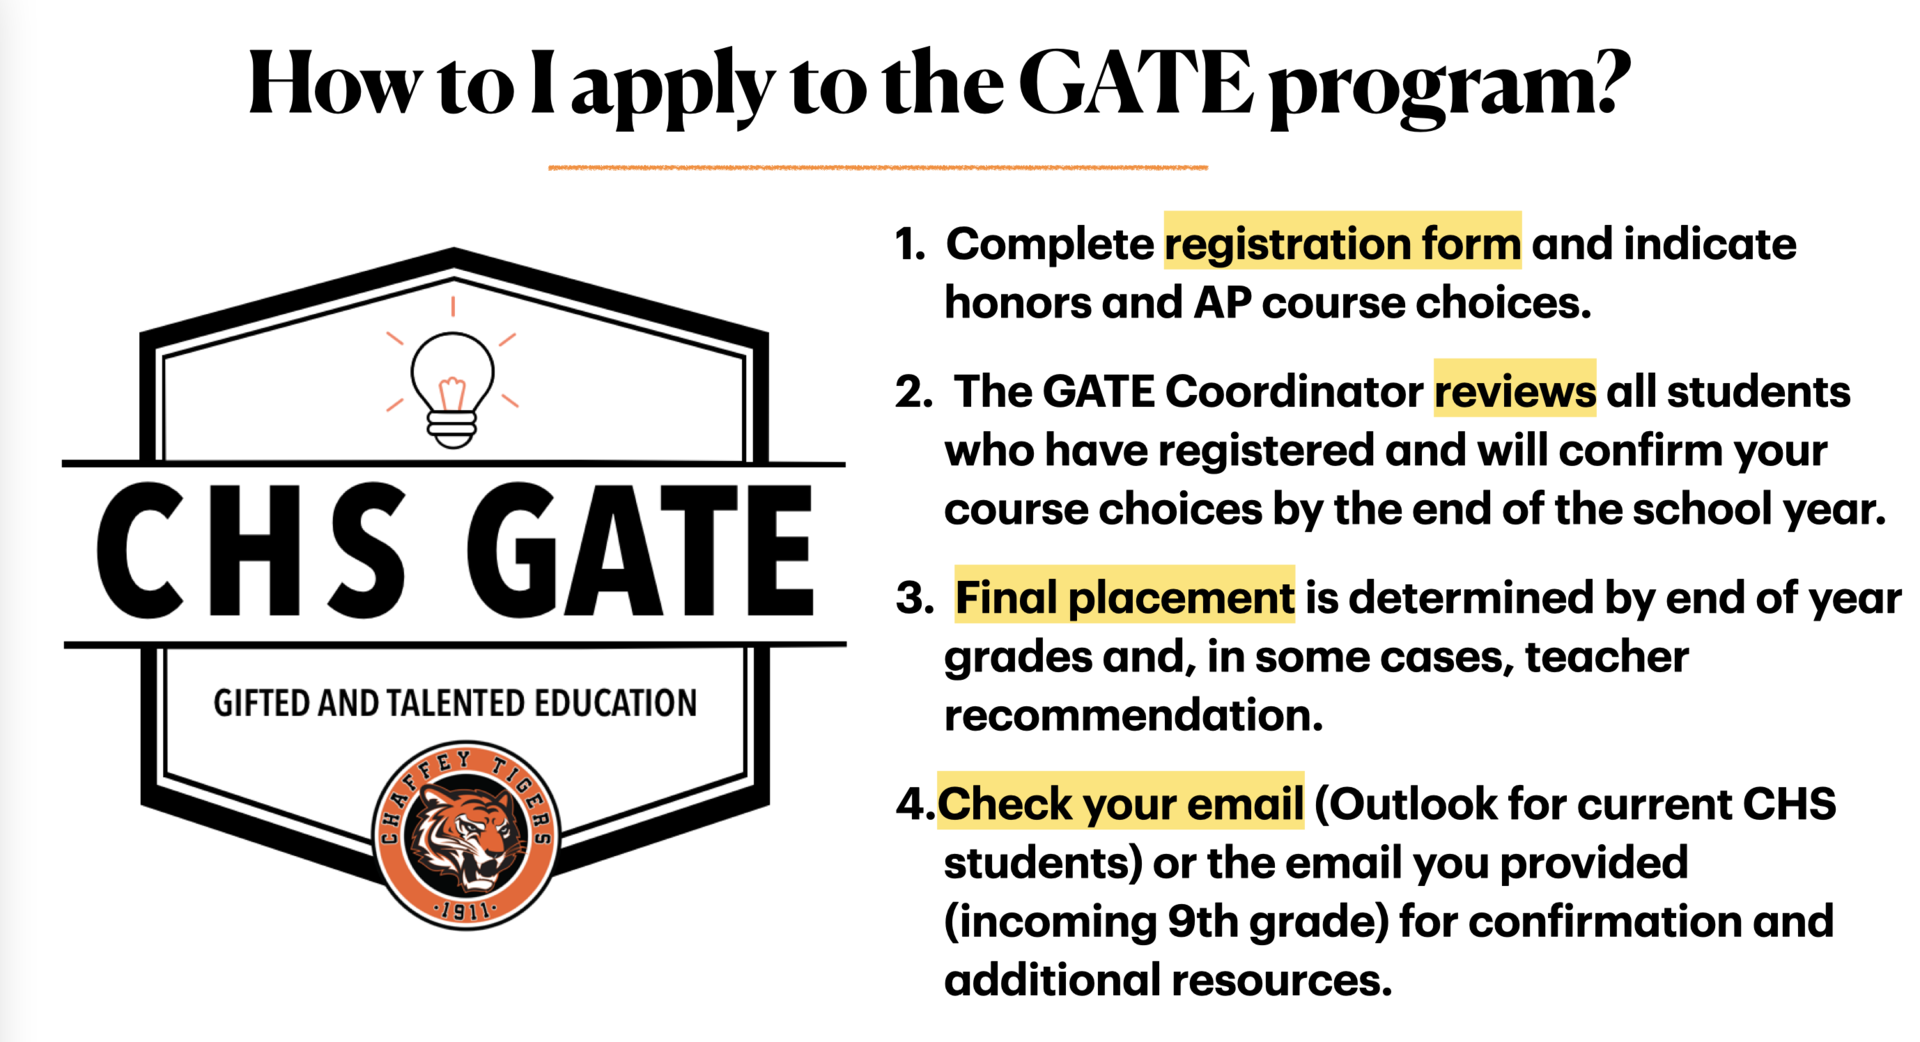 CHS GATE Program